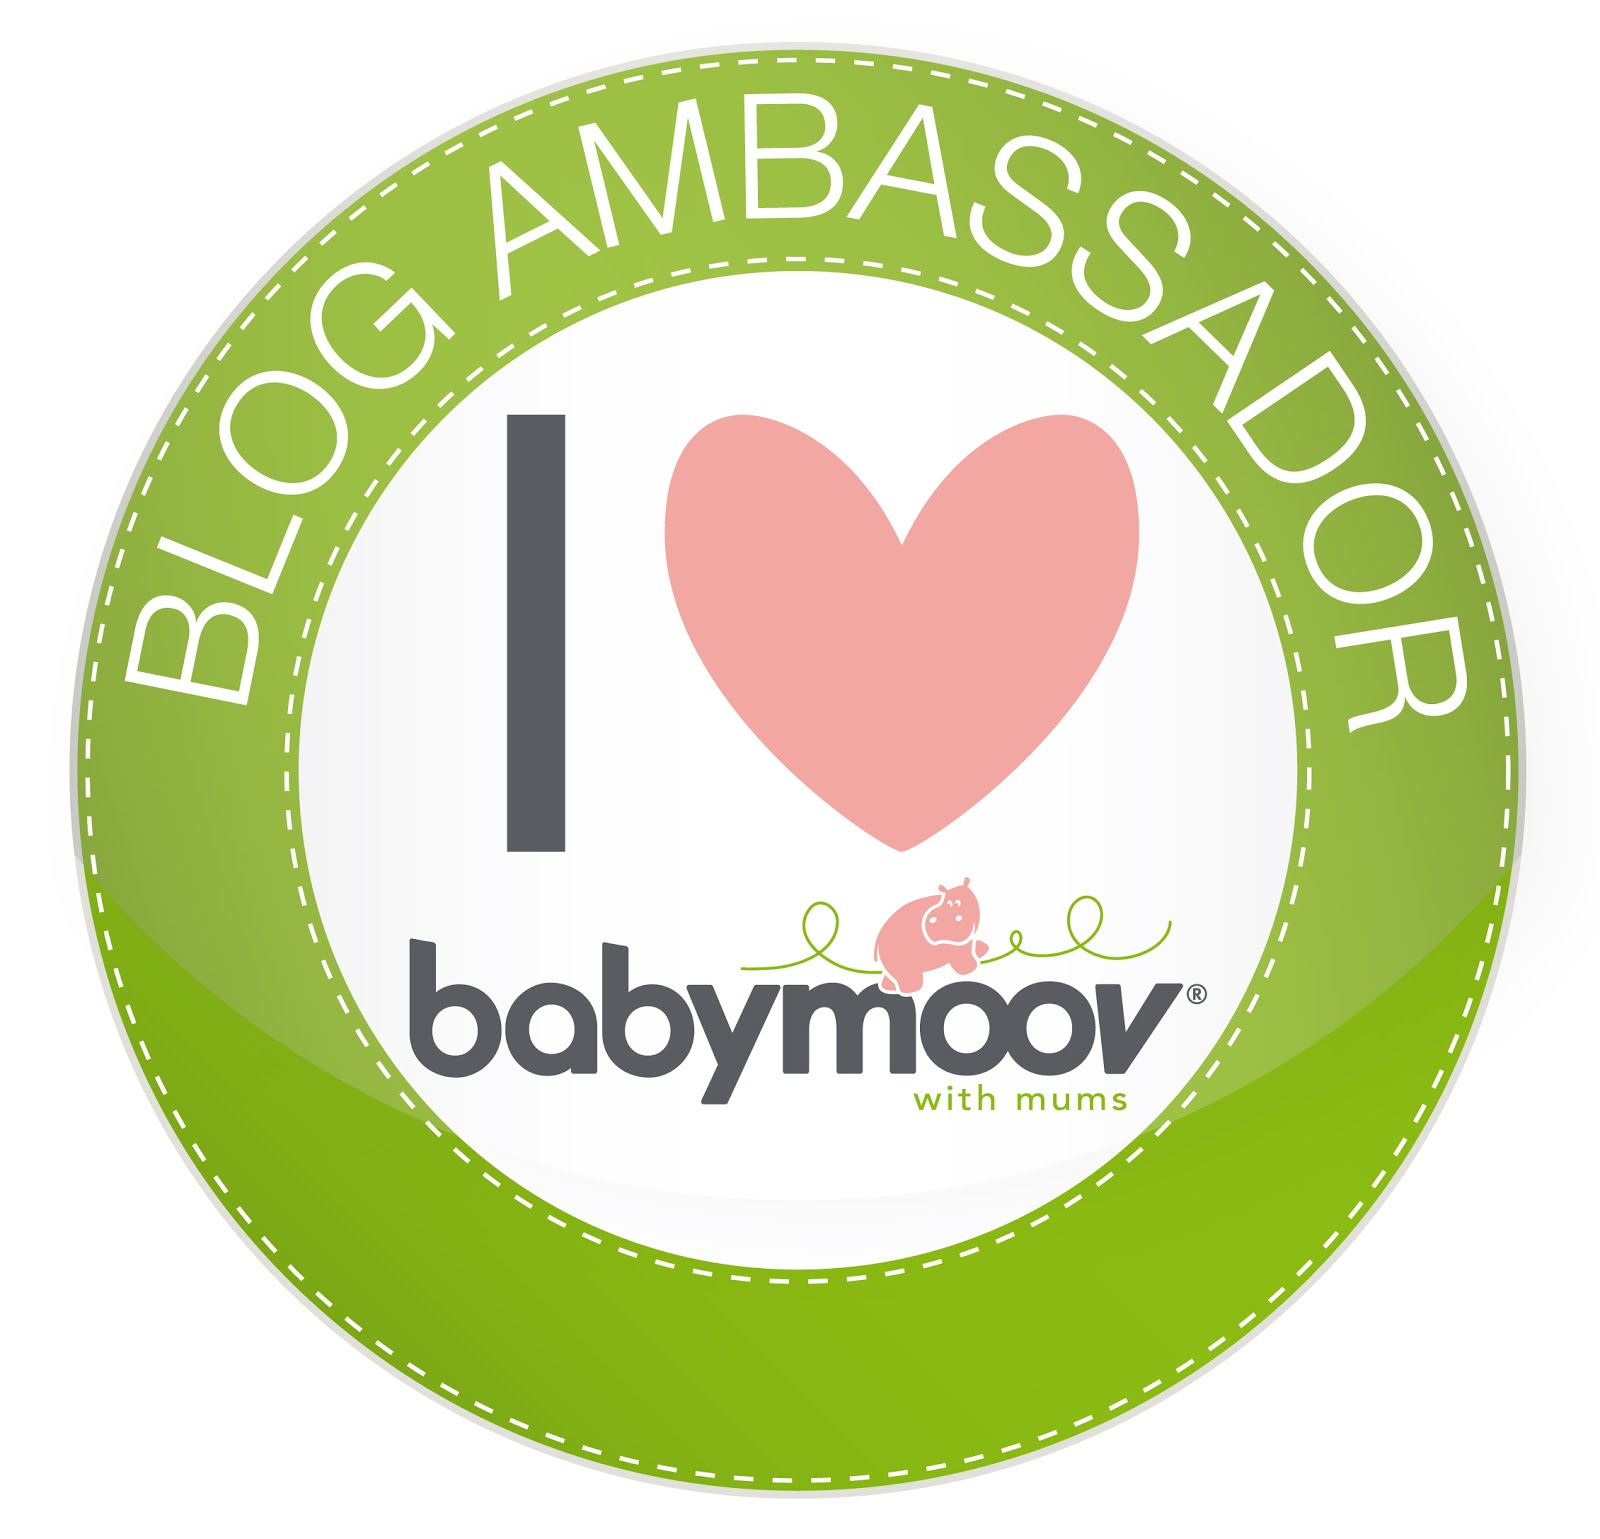 Ambassador Role